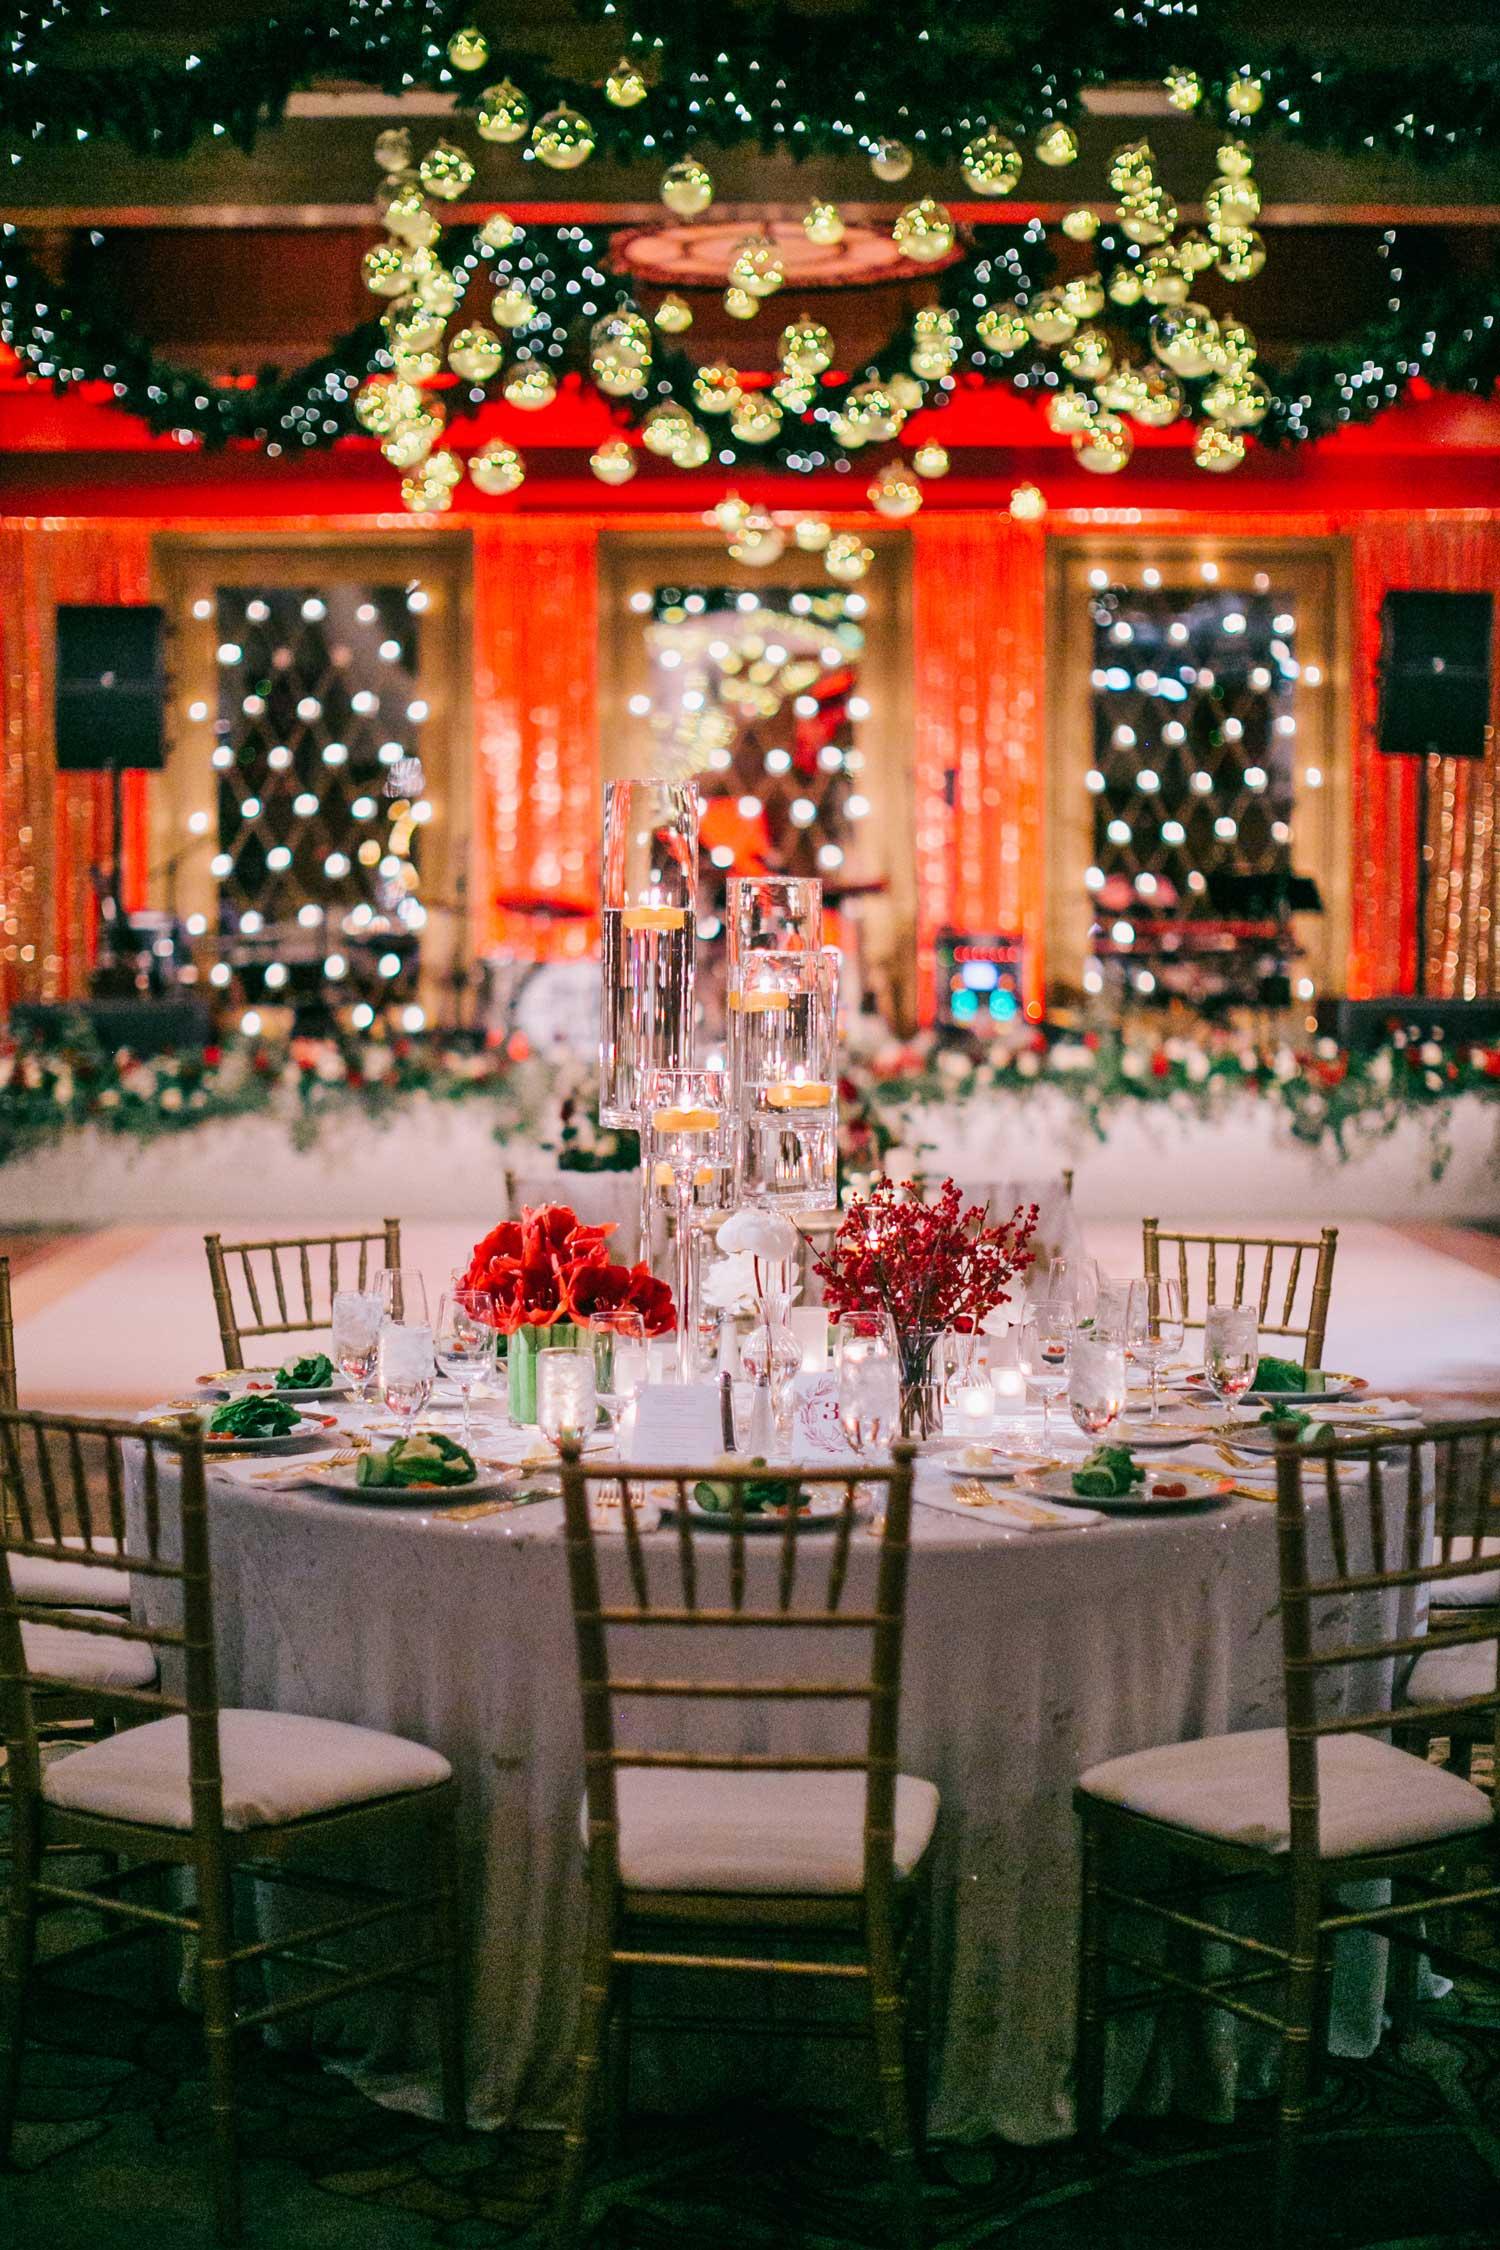 winter wedding ideas festive holiday theme for wedding reception red green